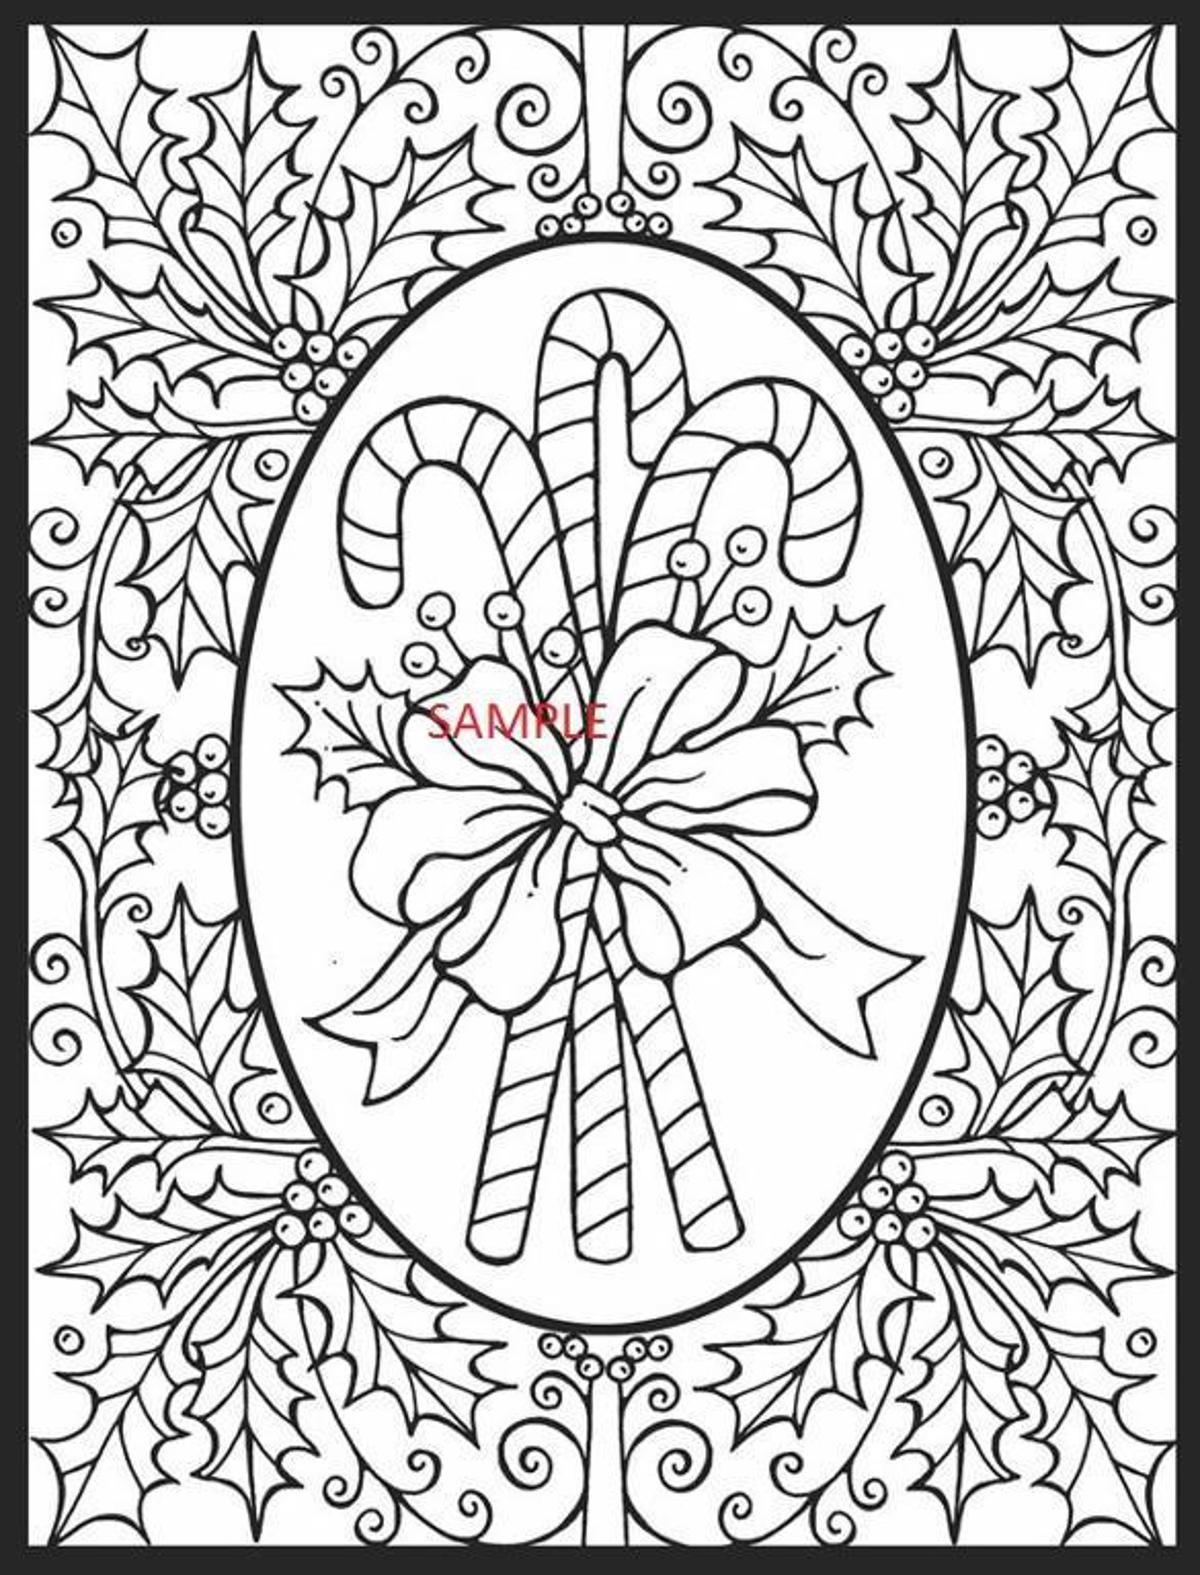 Christmas Square Cross Stitch Chart Bluprint Free Christmas Coloring Pages Printable Christmas Coloring Pages Coloring Pages